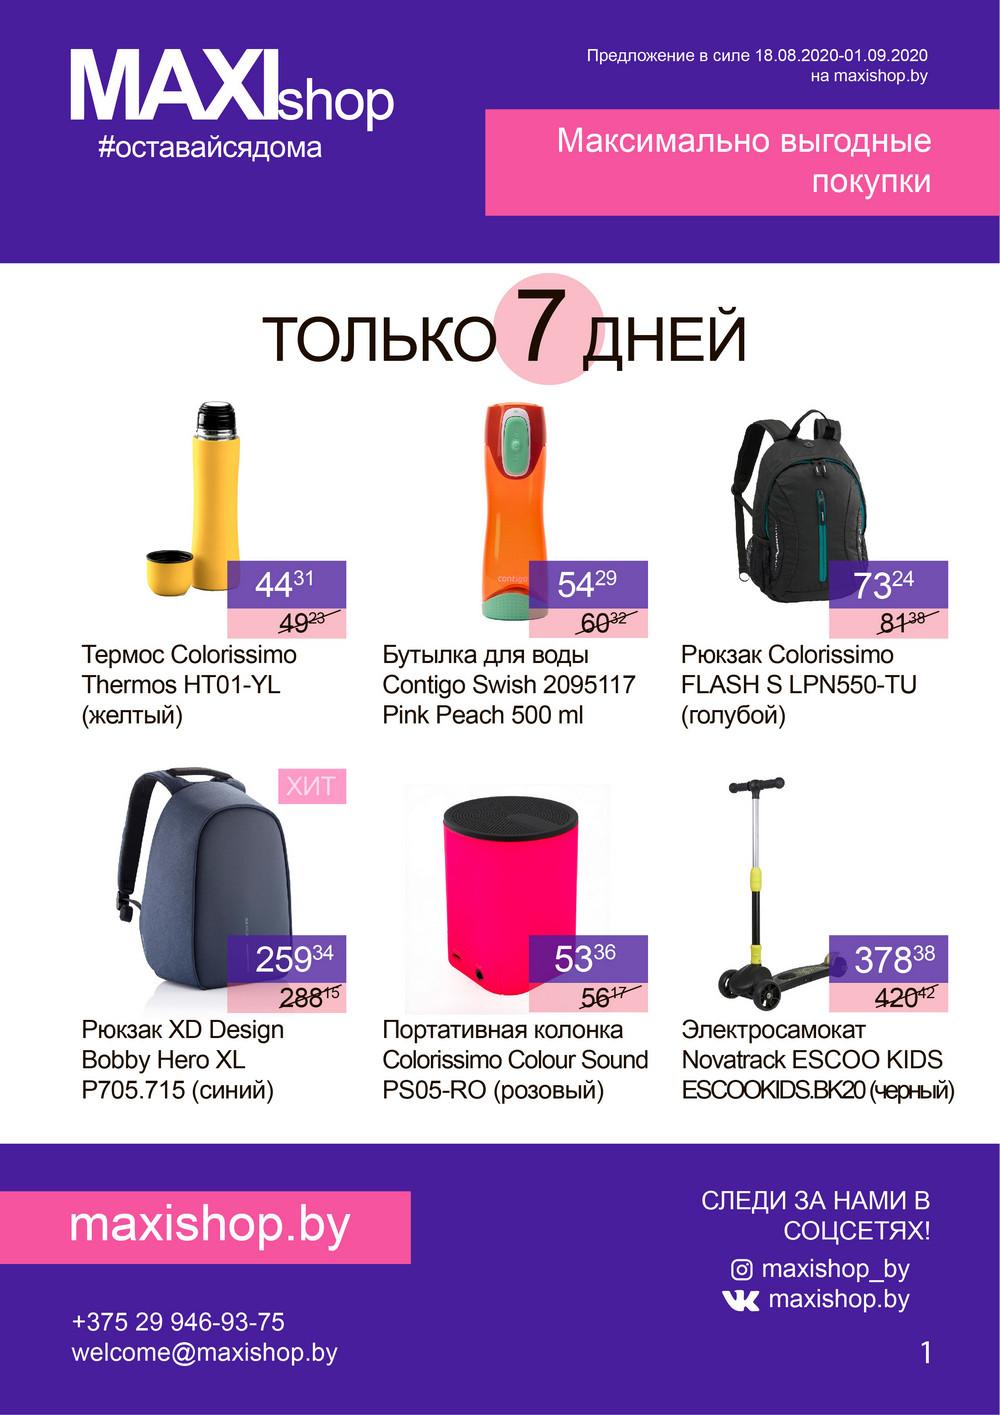 Акция в магазине MAXISHOP.BY 18 августа — 1 сентября